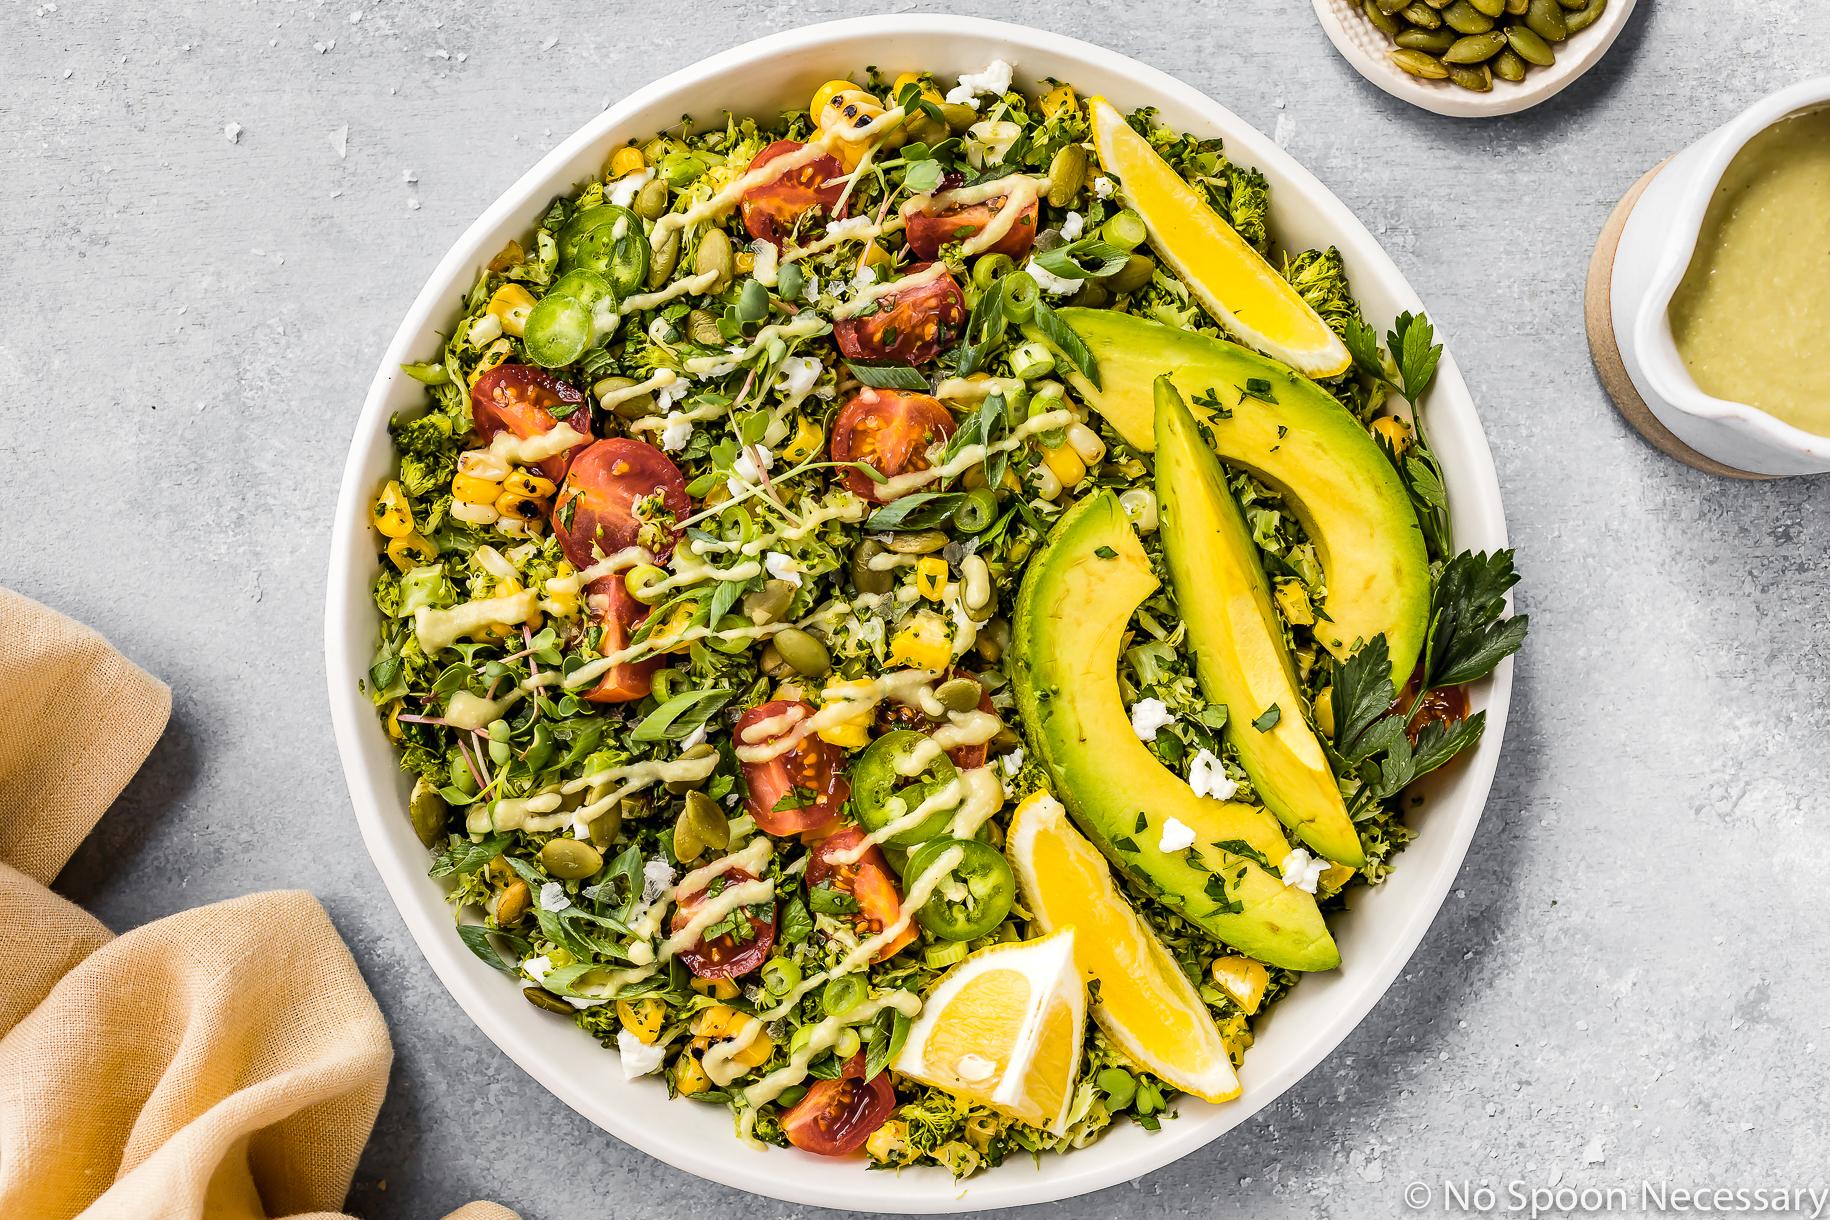 Summer Corn & Broccoli Tabbouleh